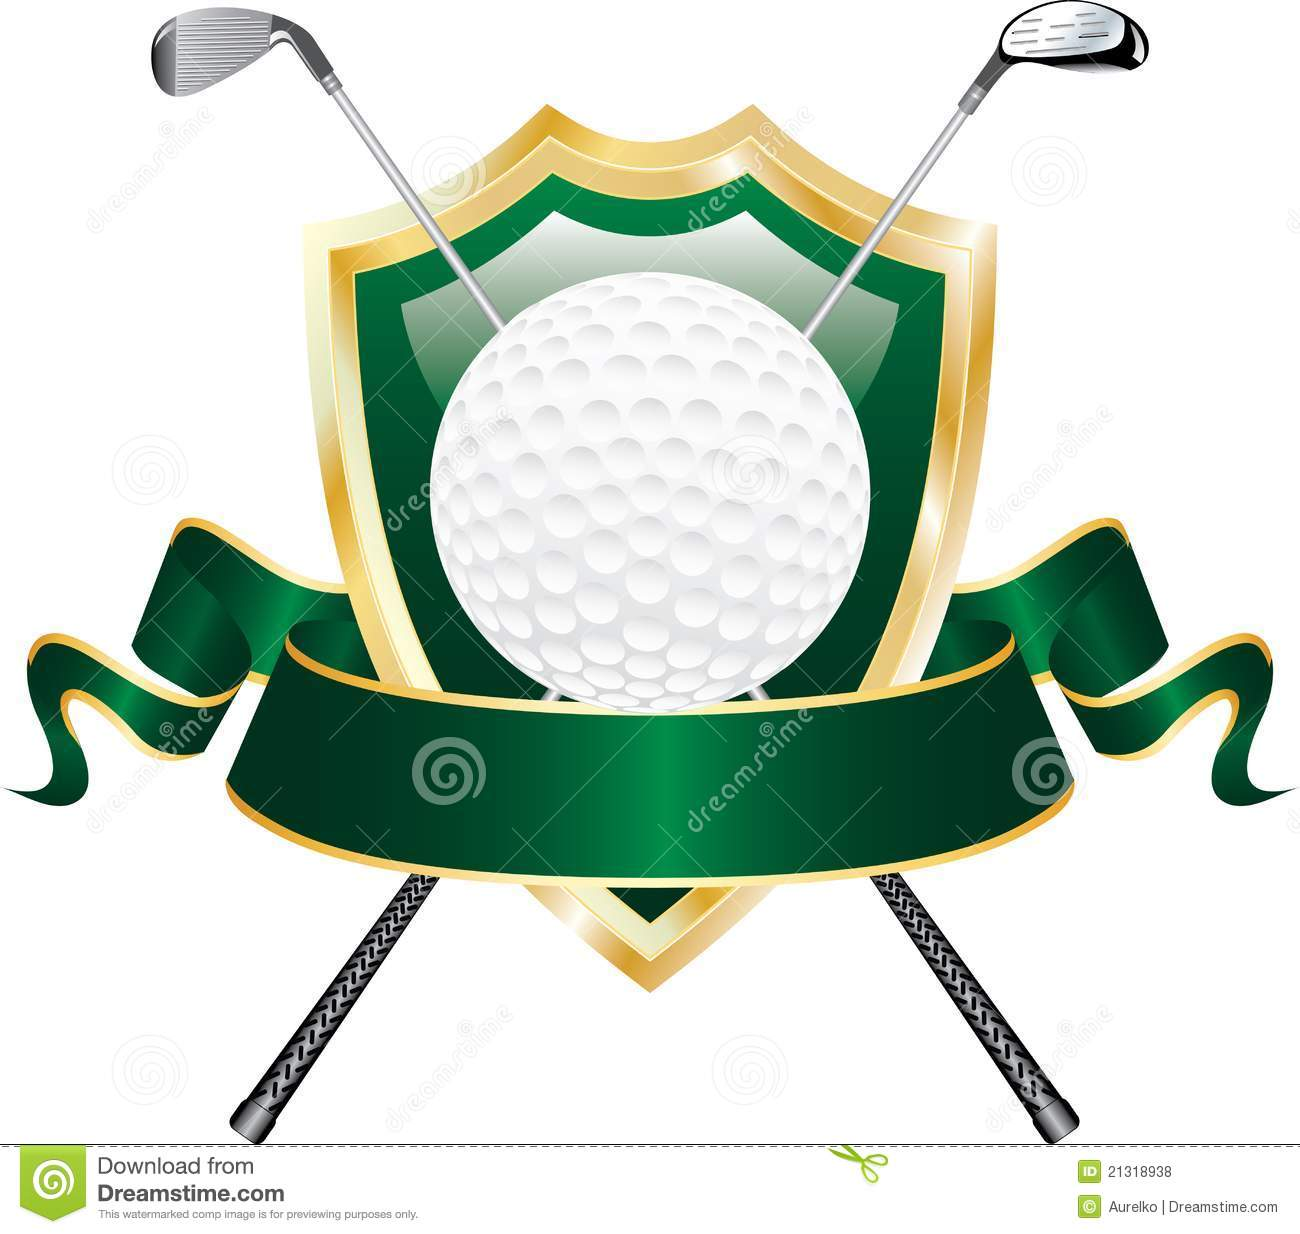 Pics Photos - Images Clipart Golf Golf Set